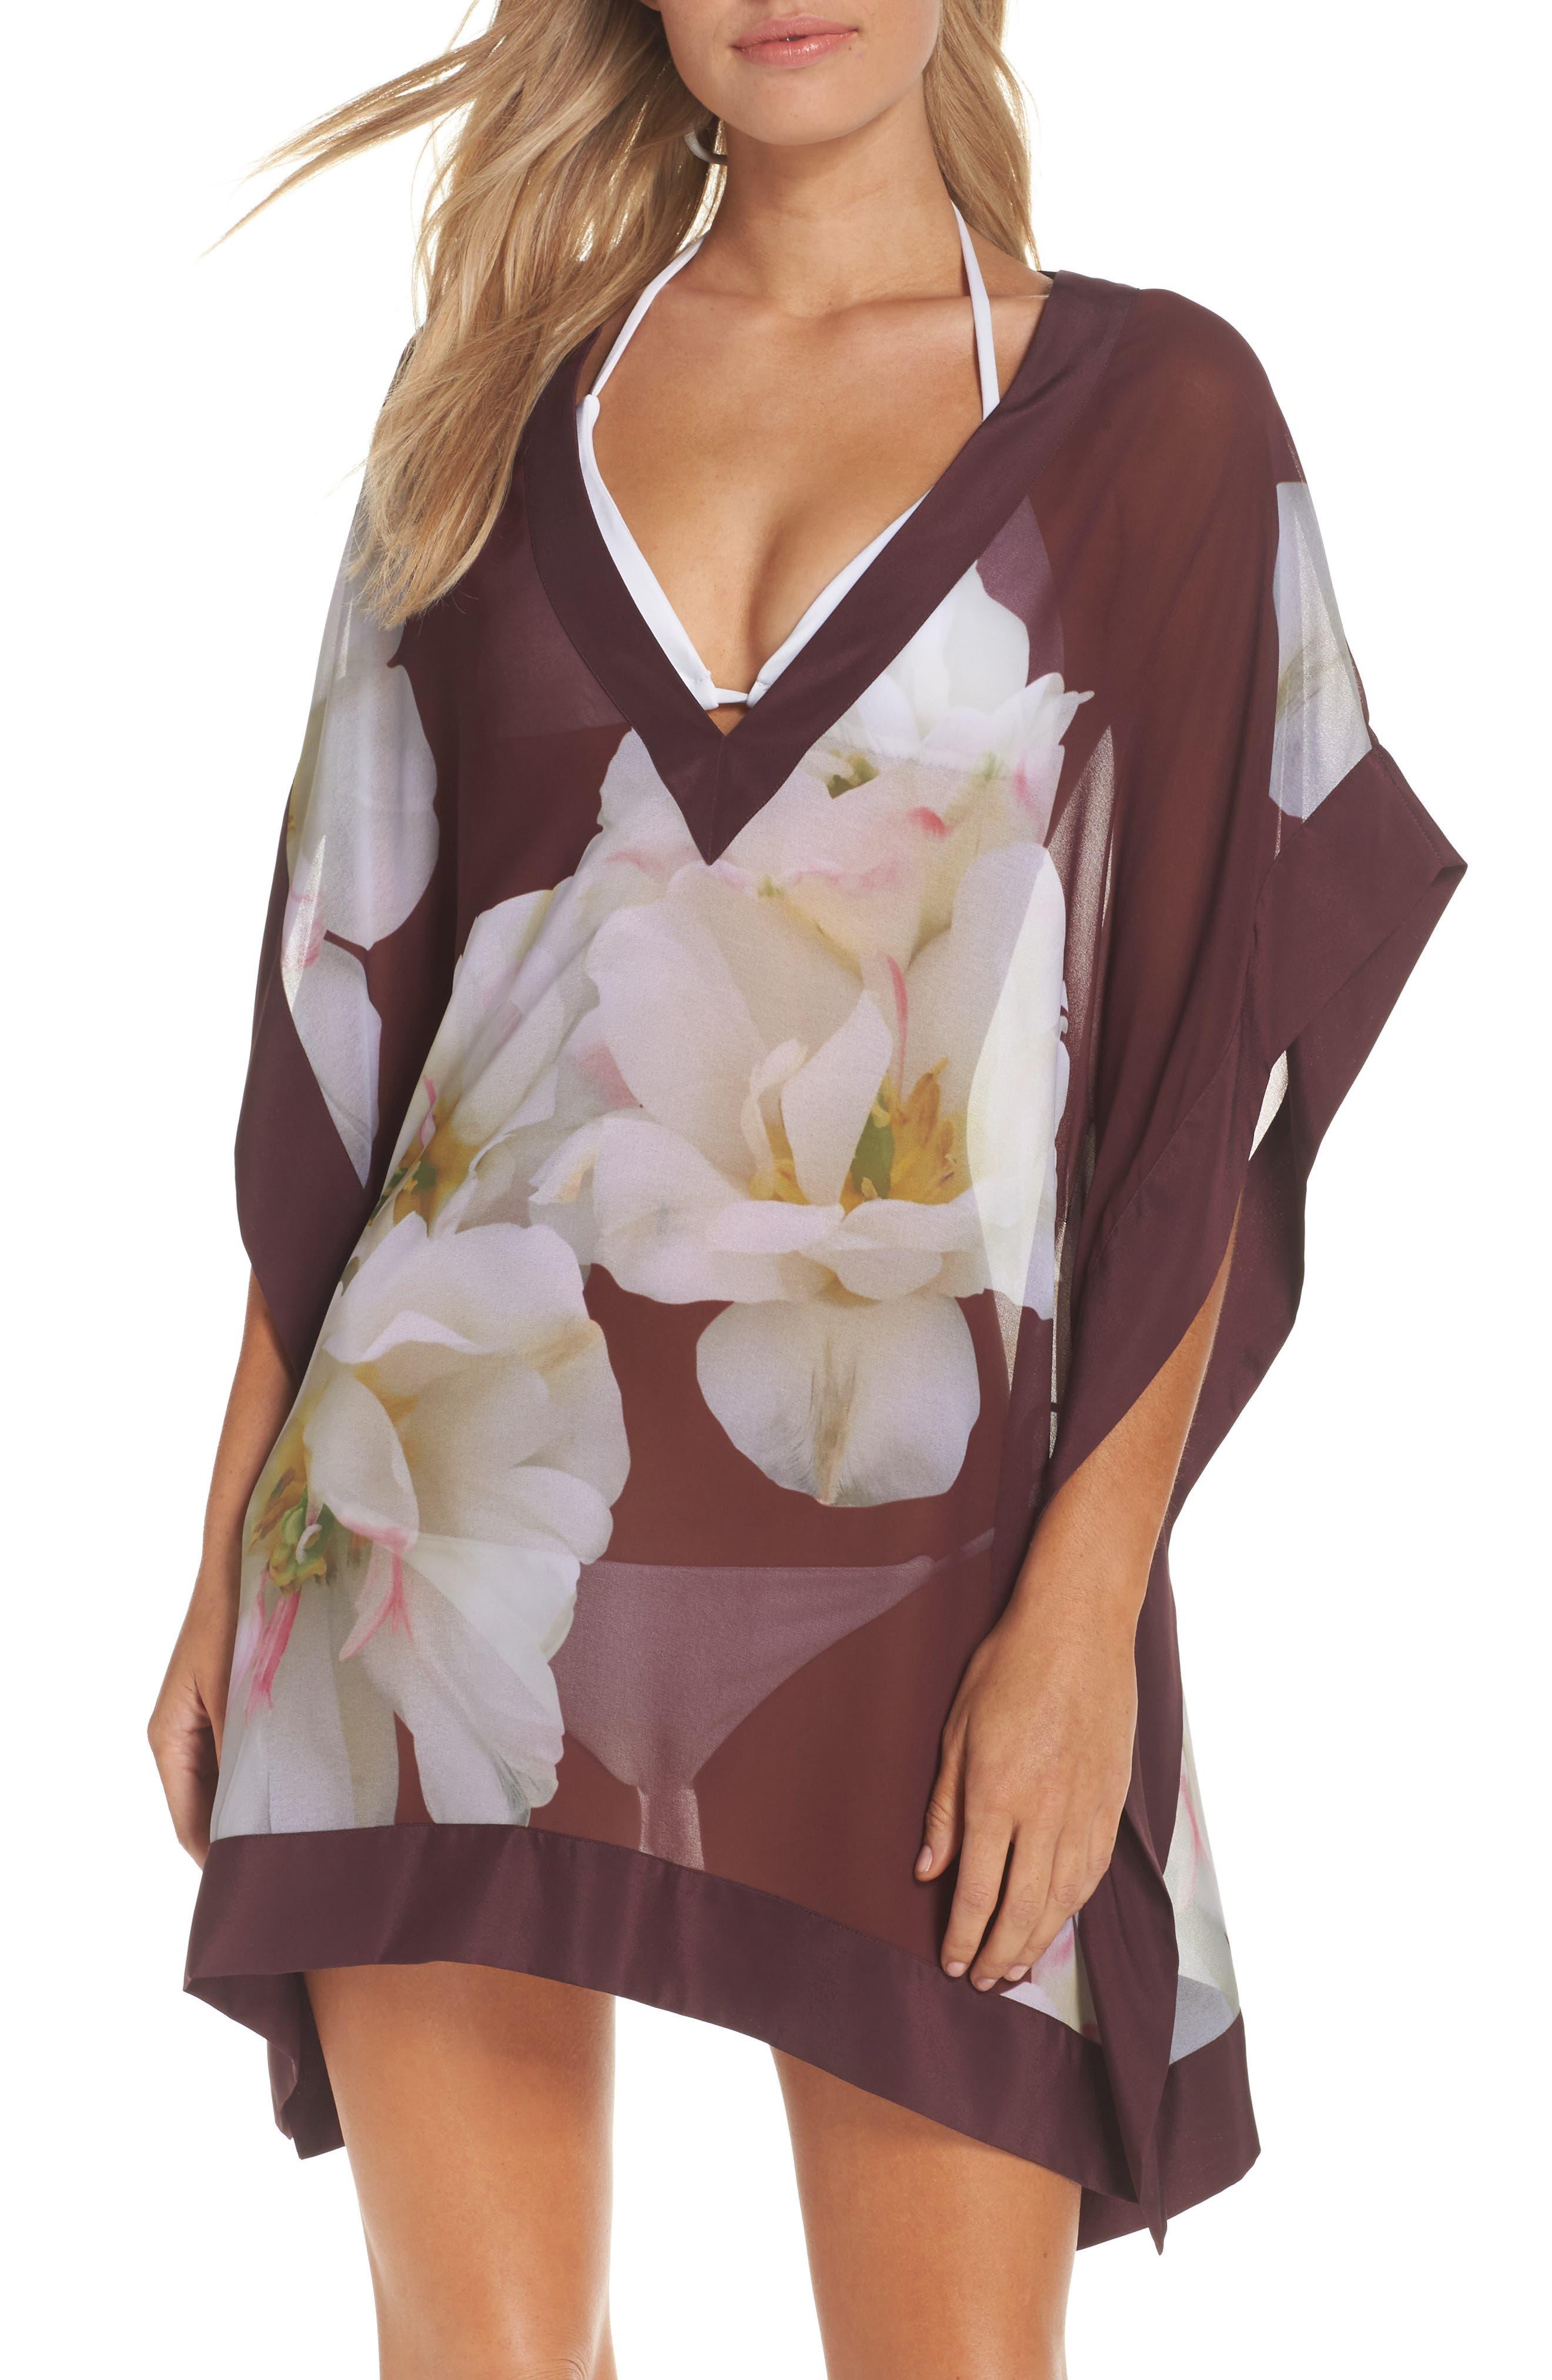 Garsa Gardenia Cover-Up Tunic,                         Main,                         color, Maroon